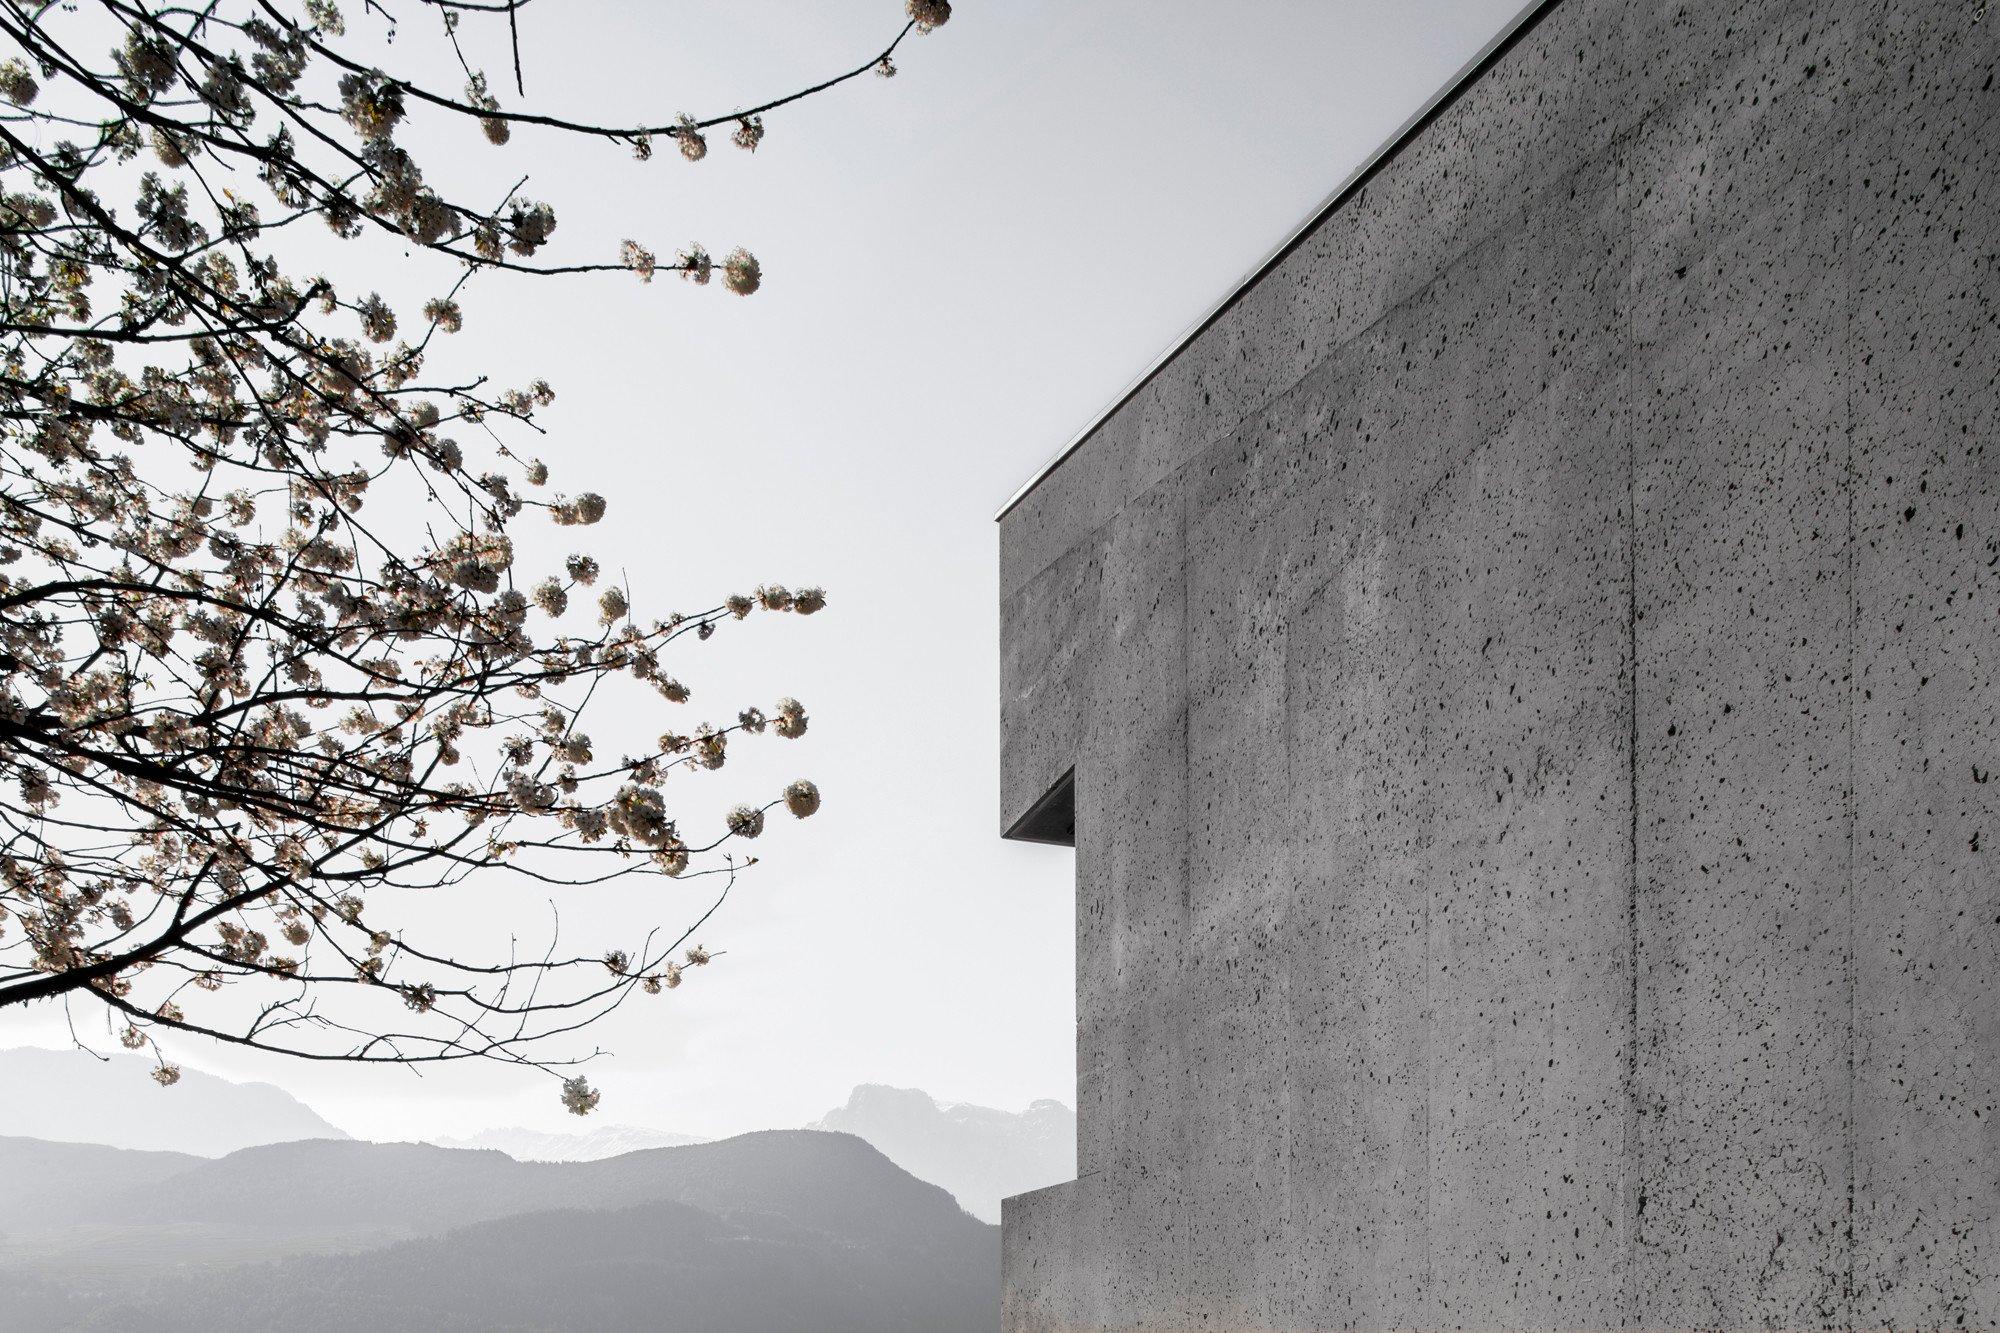 Wunderbar Waterford Kristallfeld Fotos - Rahmen Ideen ...